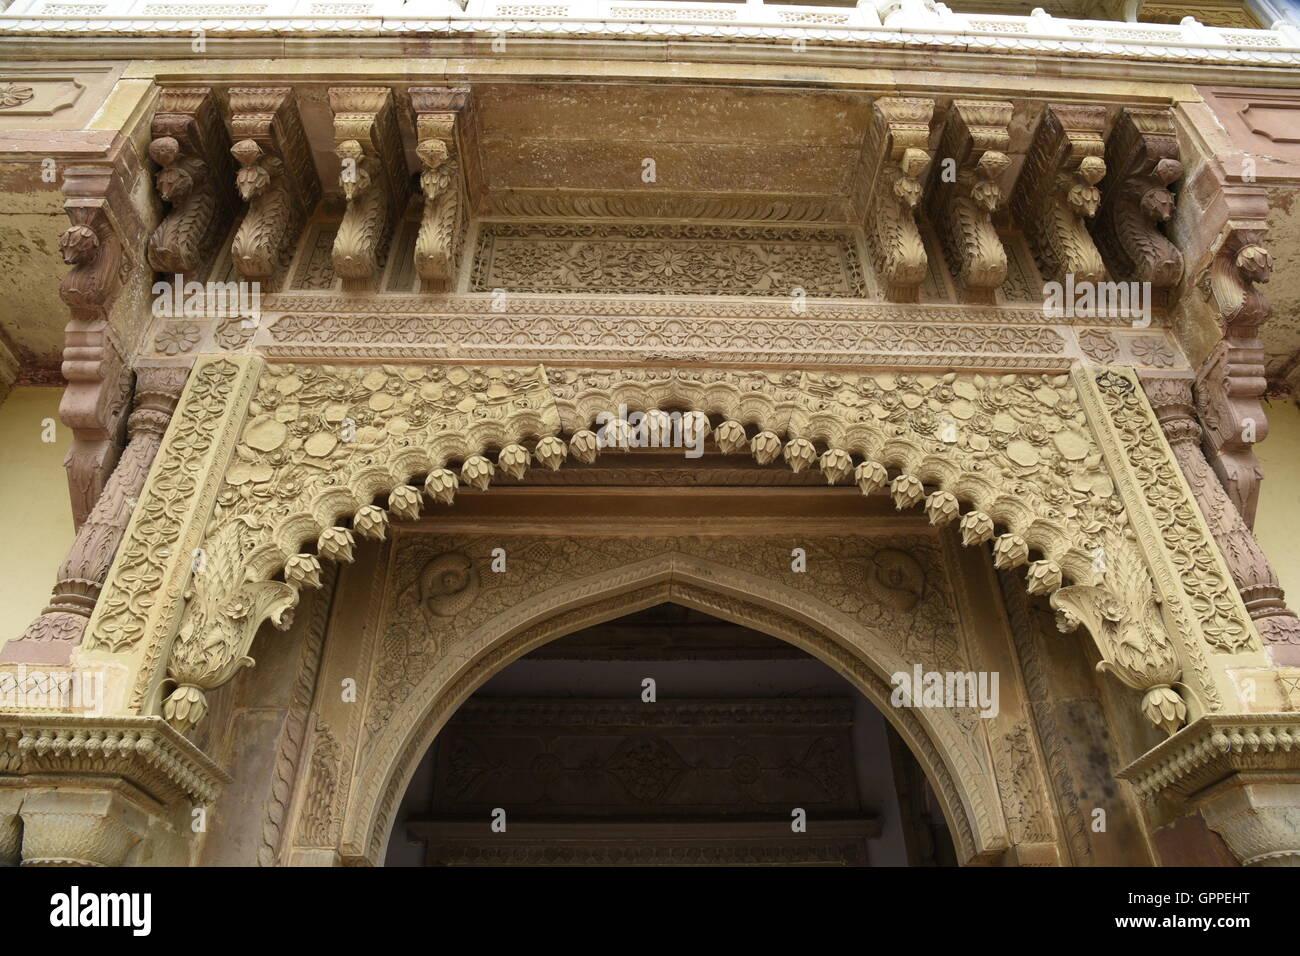 Beautiful Ramnagar fort  with colorful incredible detailed architecture in Varanasi or banaras near sarnath Uttar Pradesh India Stock Photo